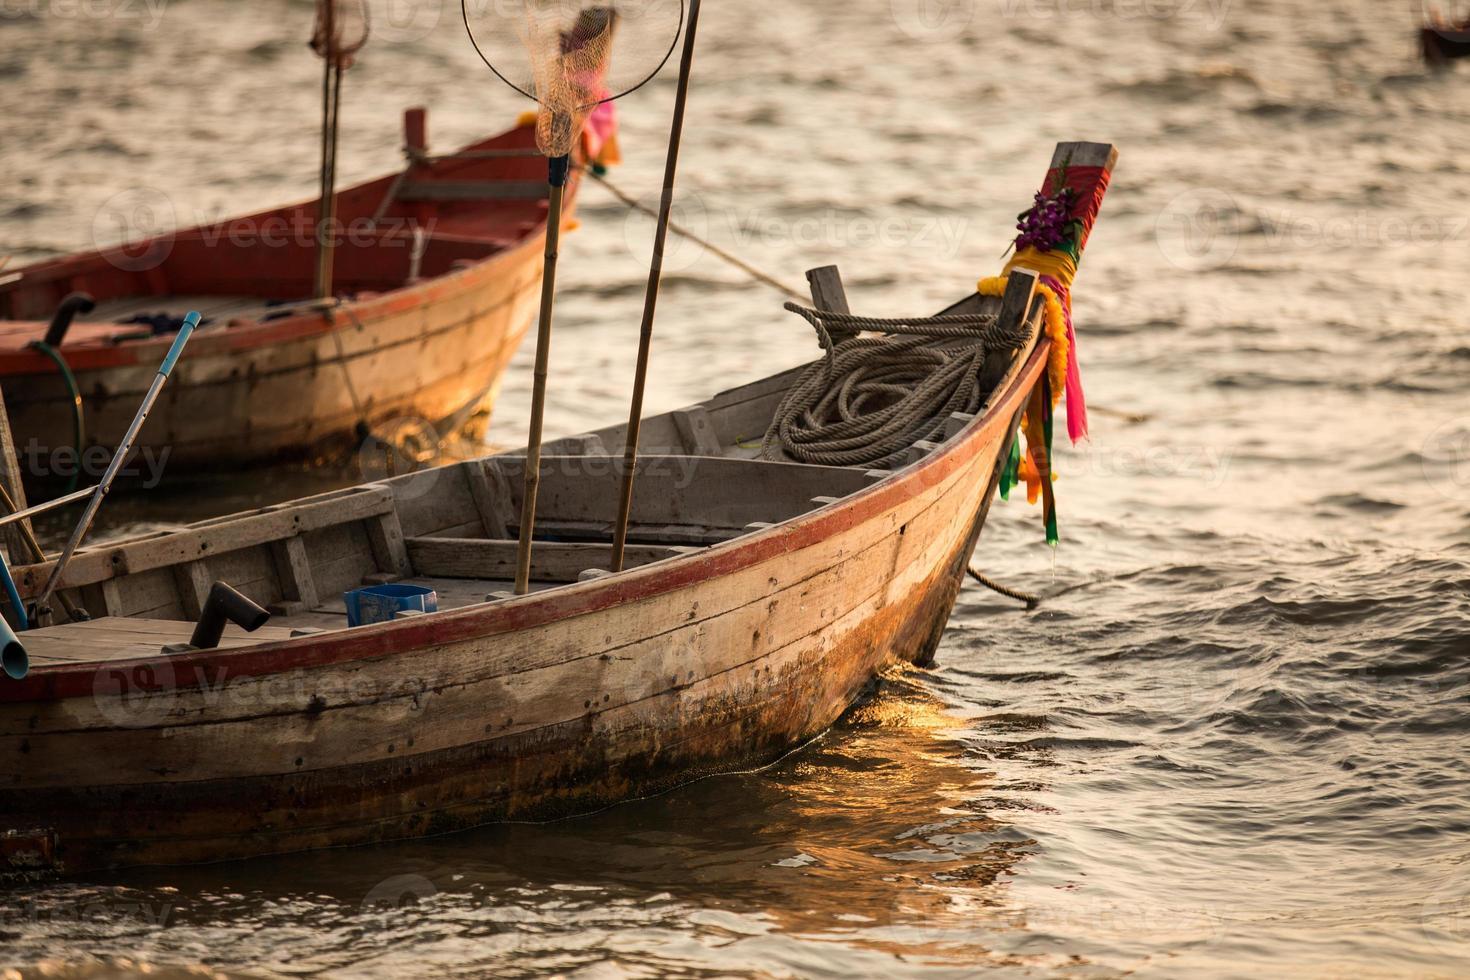 Barco de pesca tailandés utilizado como vehículo para encontrar peces. foto